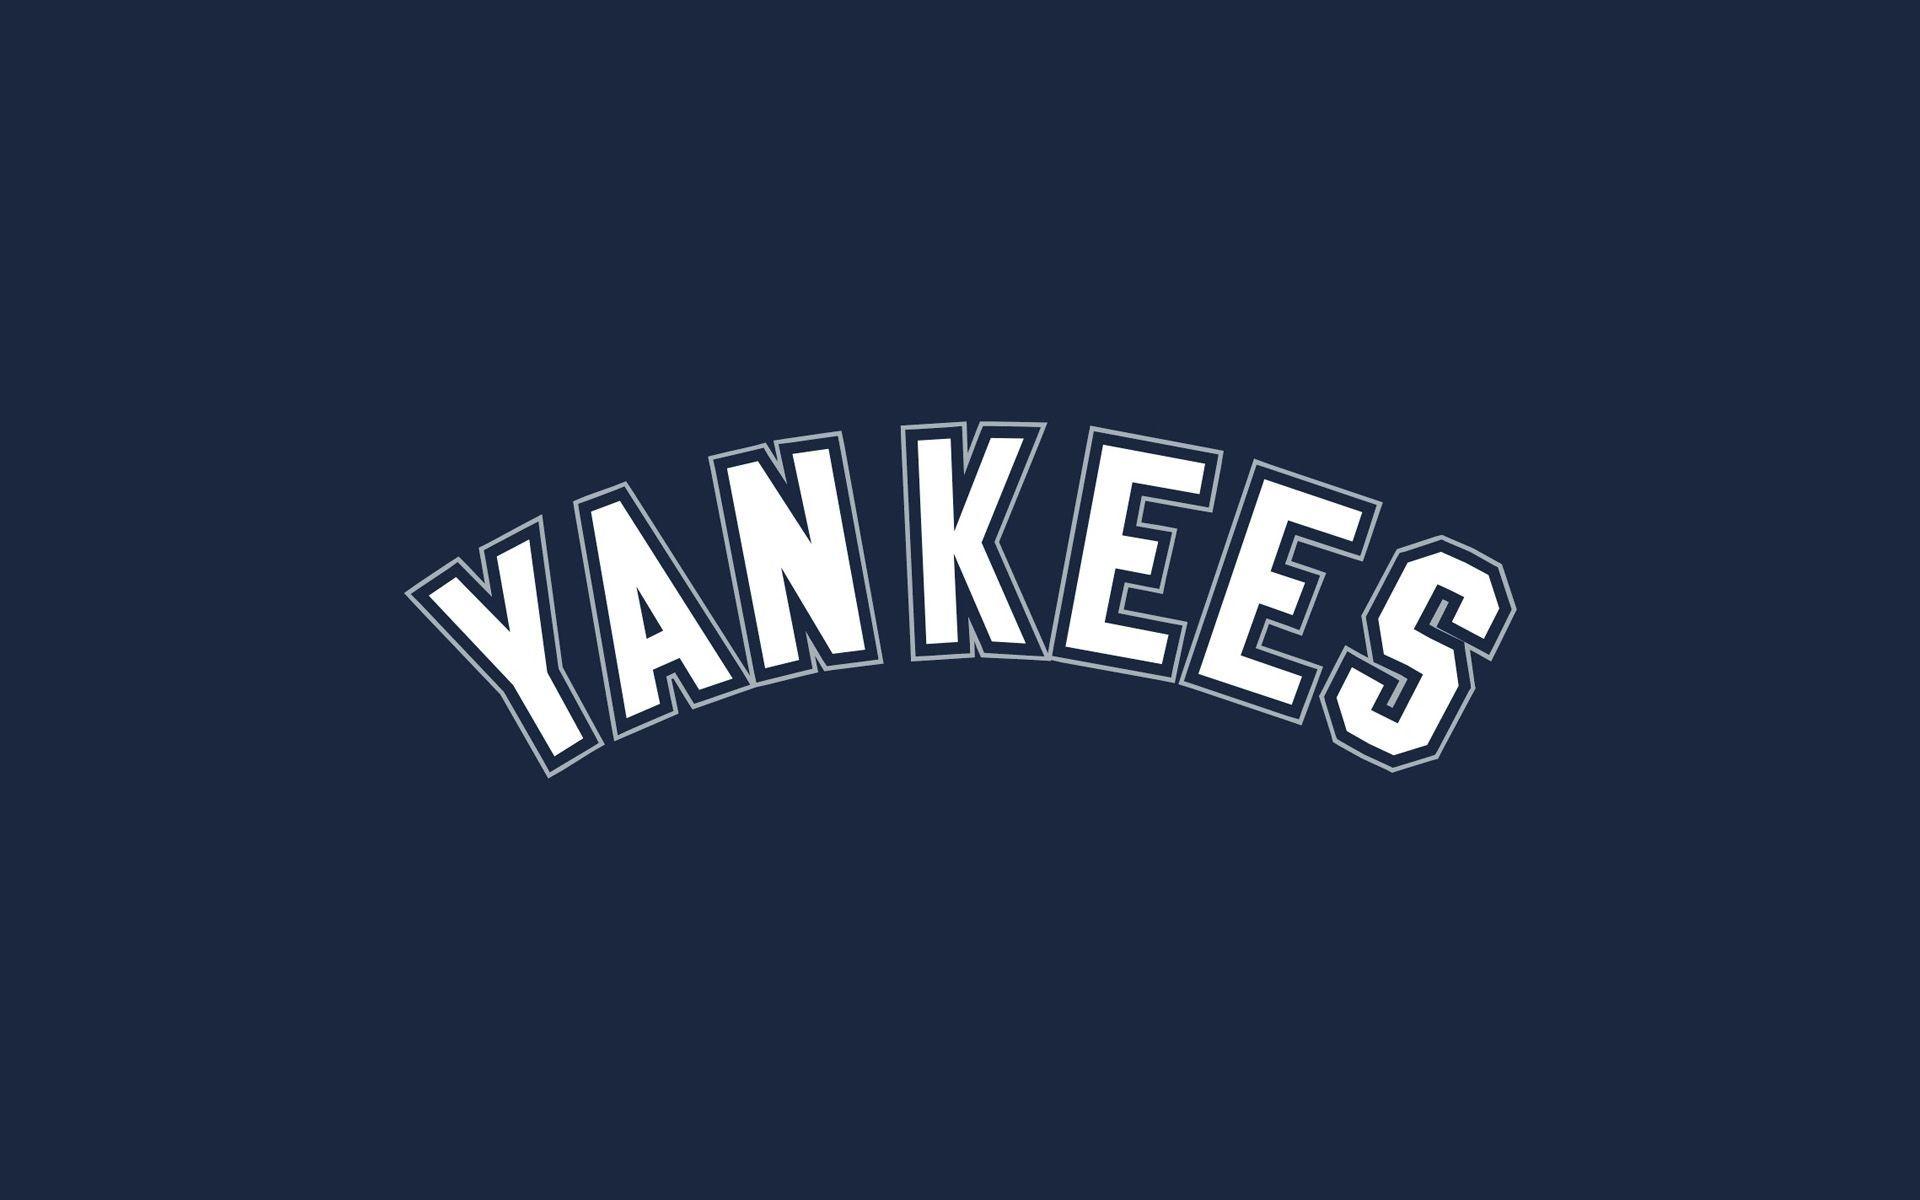 Yankees HD Wallpapers Group